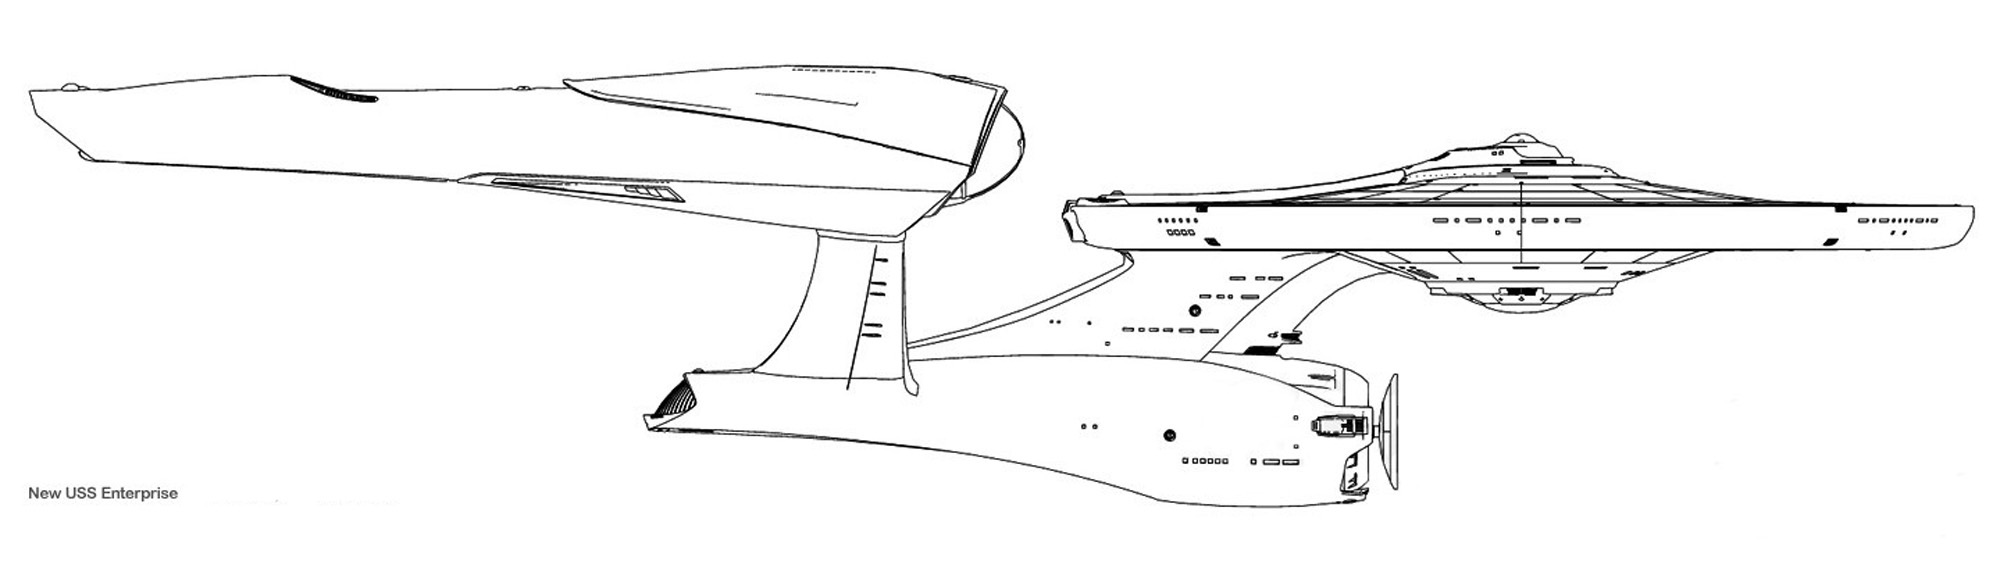 Star Trek Blueprints: New U.S.S. Enterprise NCC-1701 ...